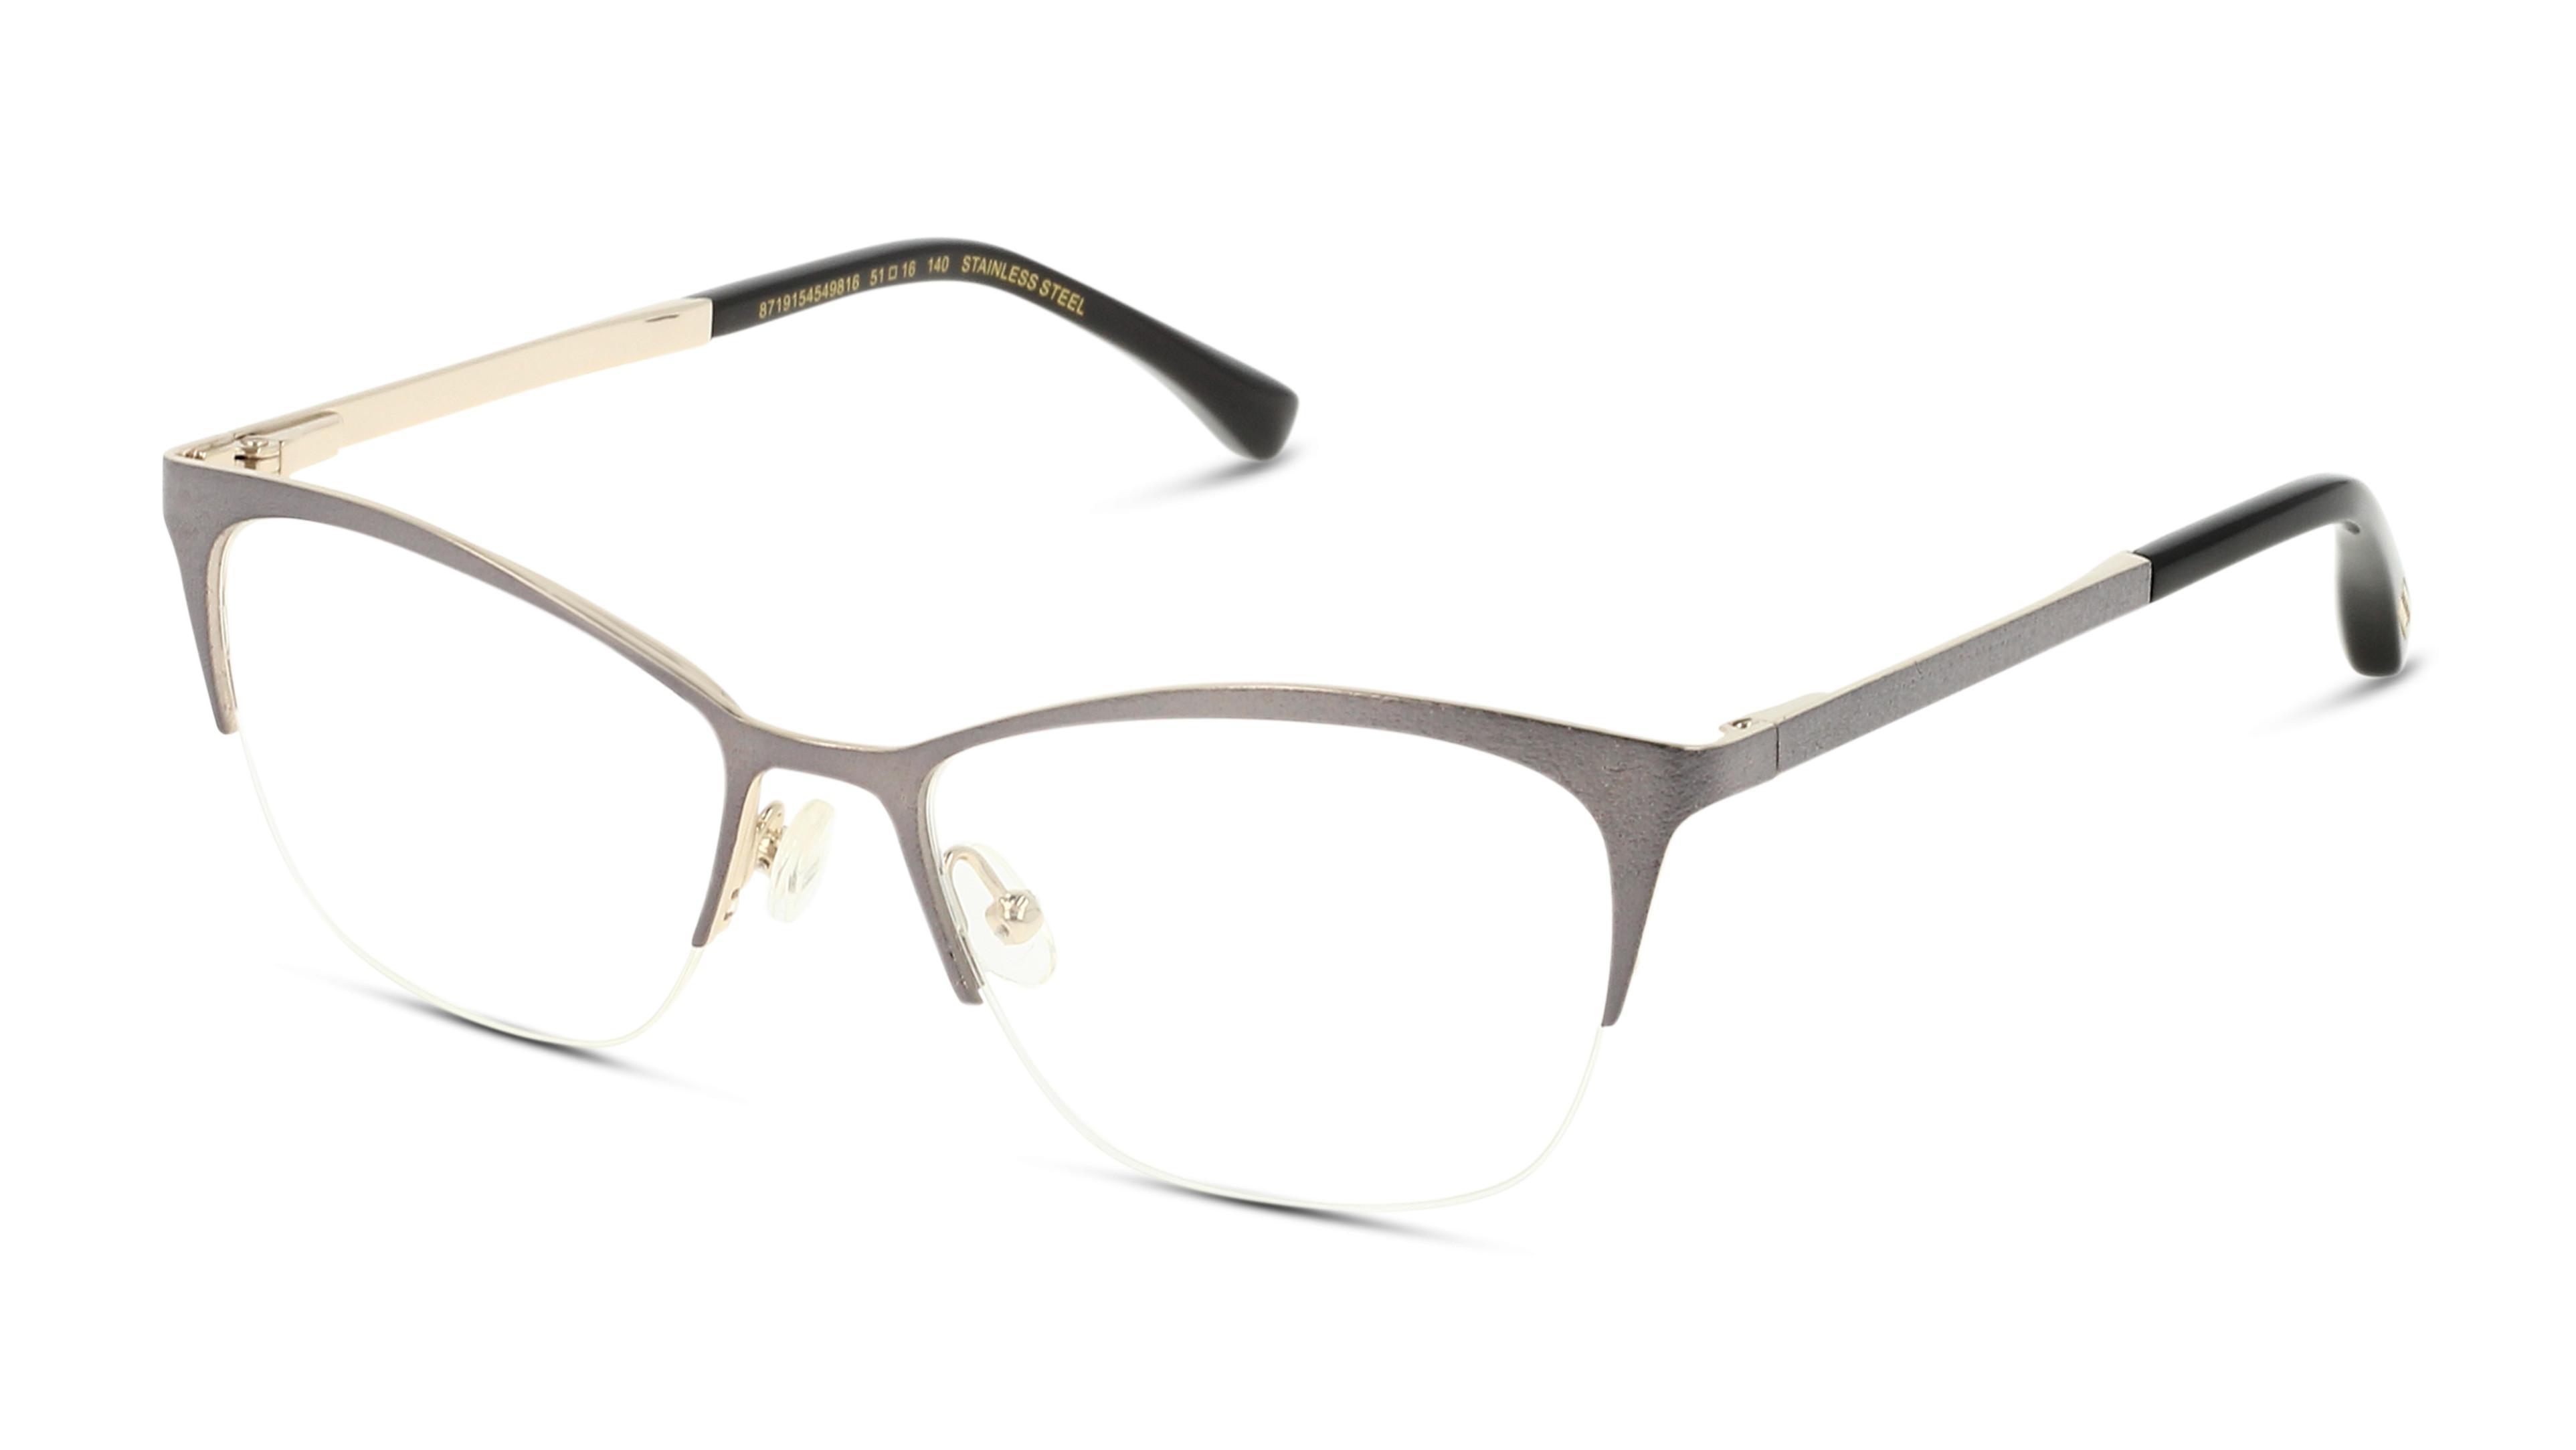 8719154619465-angle-03-sensaya-syjf44-Eyewear-black-gold